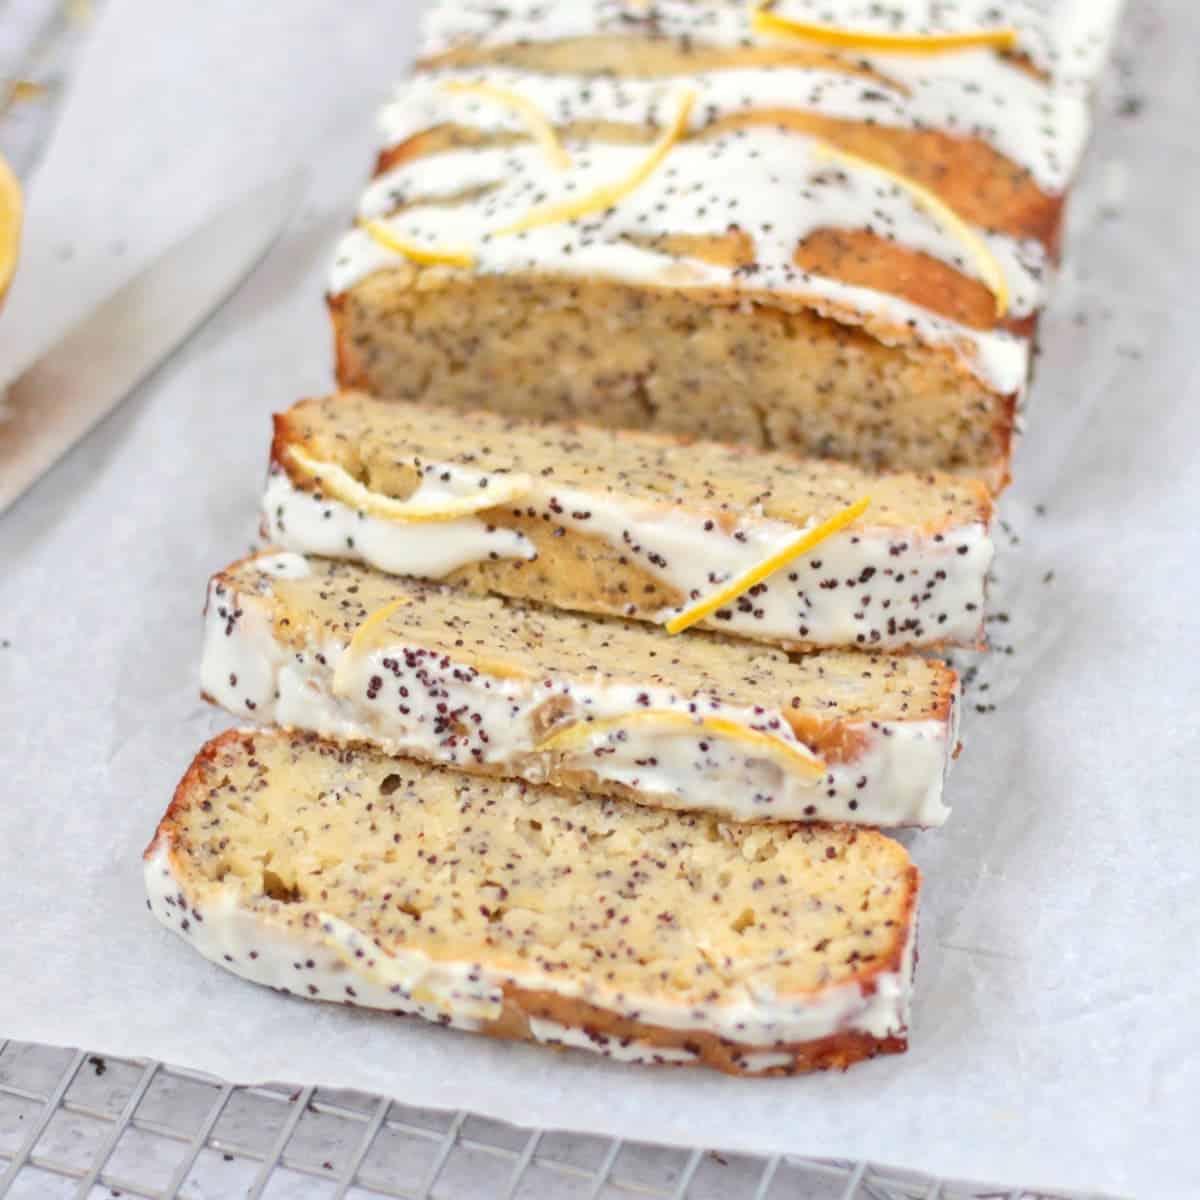 Sliced Poppy Seed Loaf